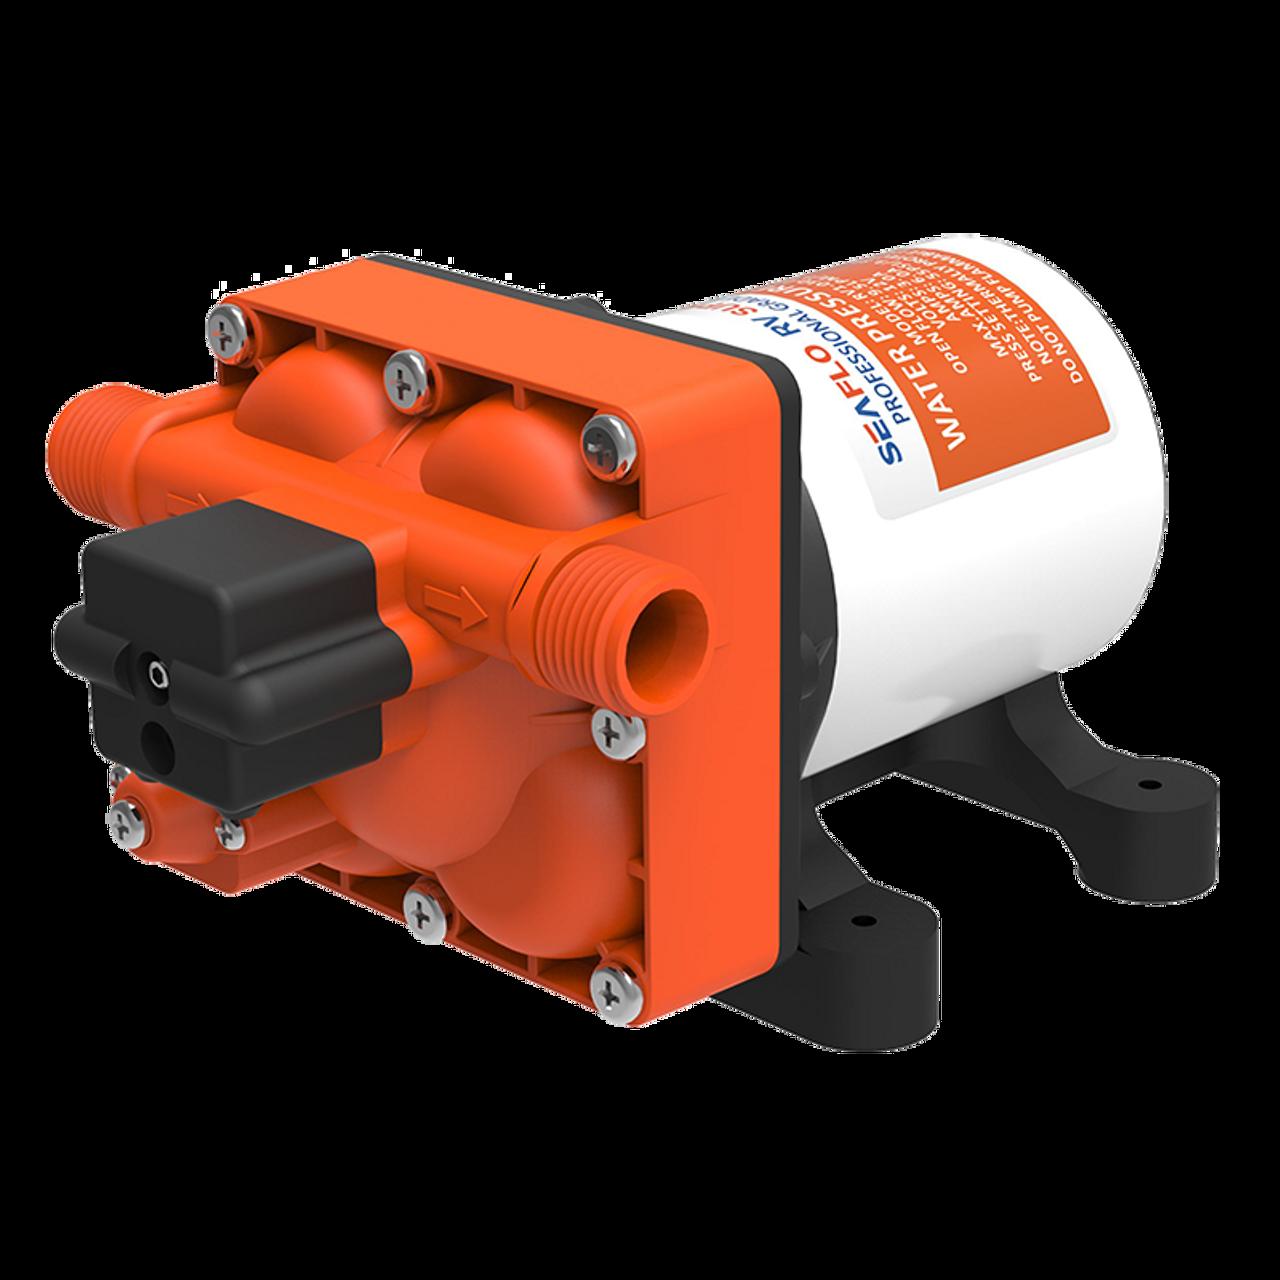 SEAFLO RV Supreme 55psi/9.5LMP 24V Water Pump c/w Filter & Fittings |  800-03302